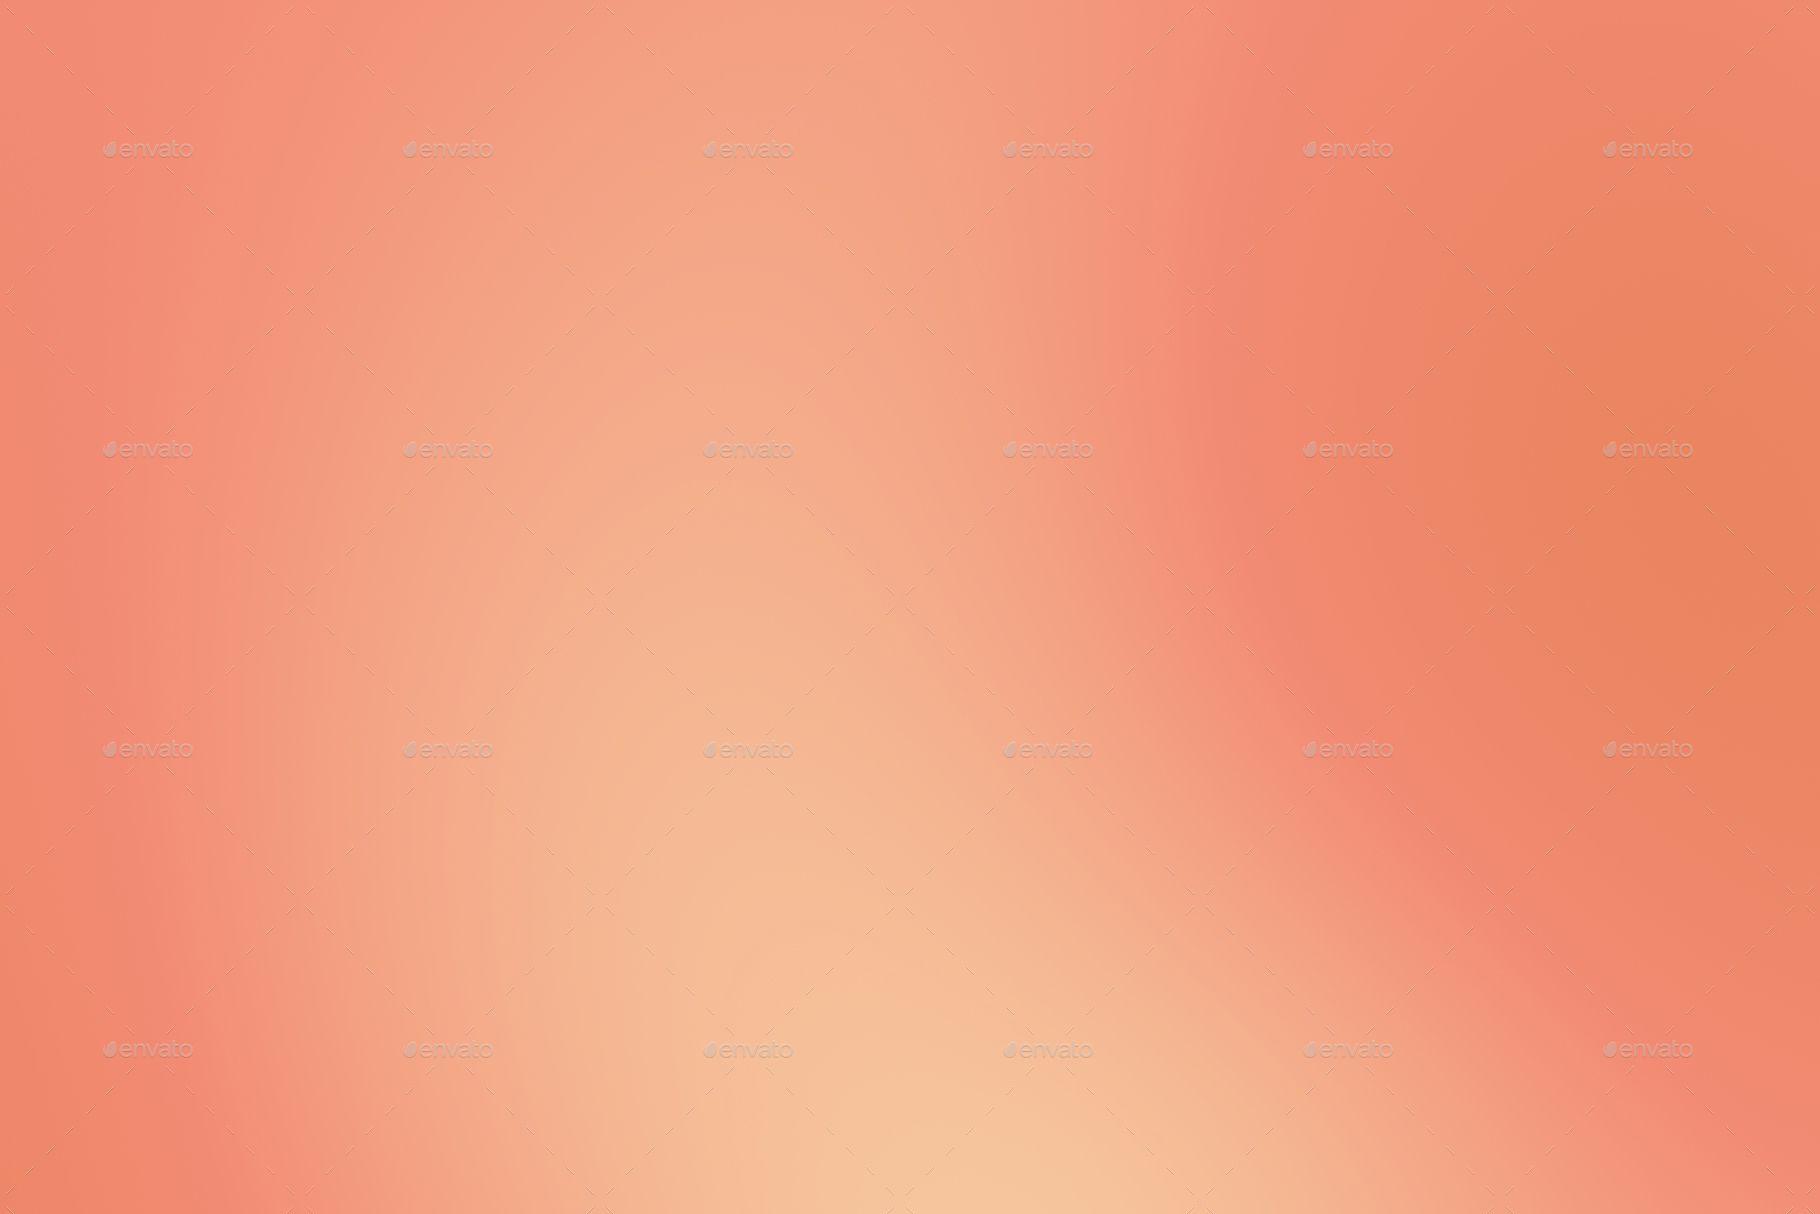 Unduh 44 Koleksi Background Gradient Gratis